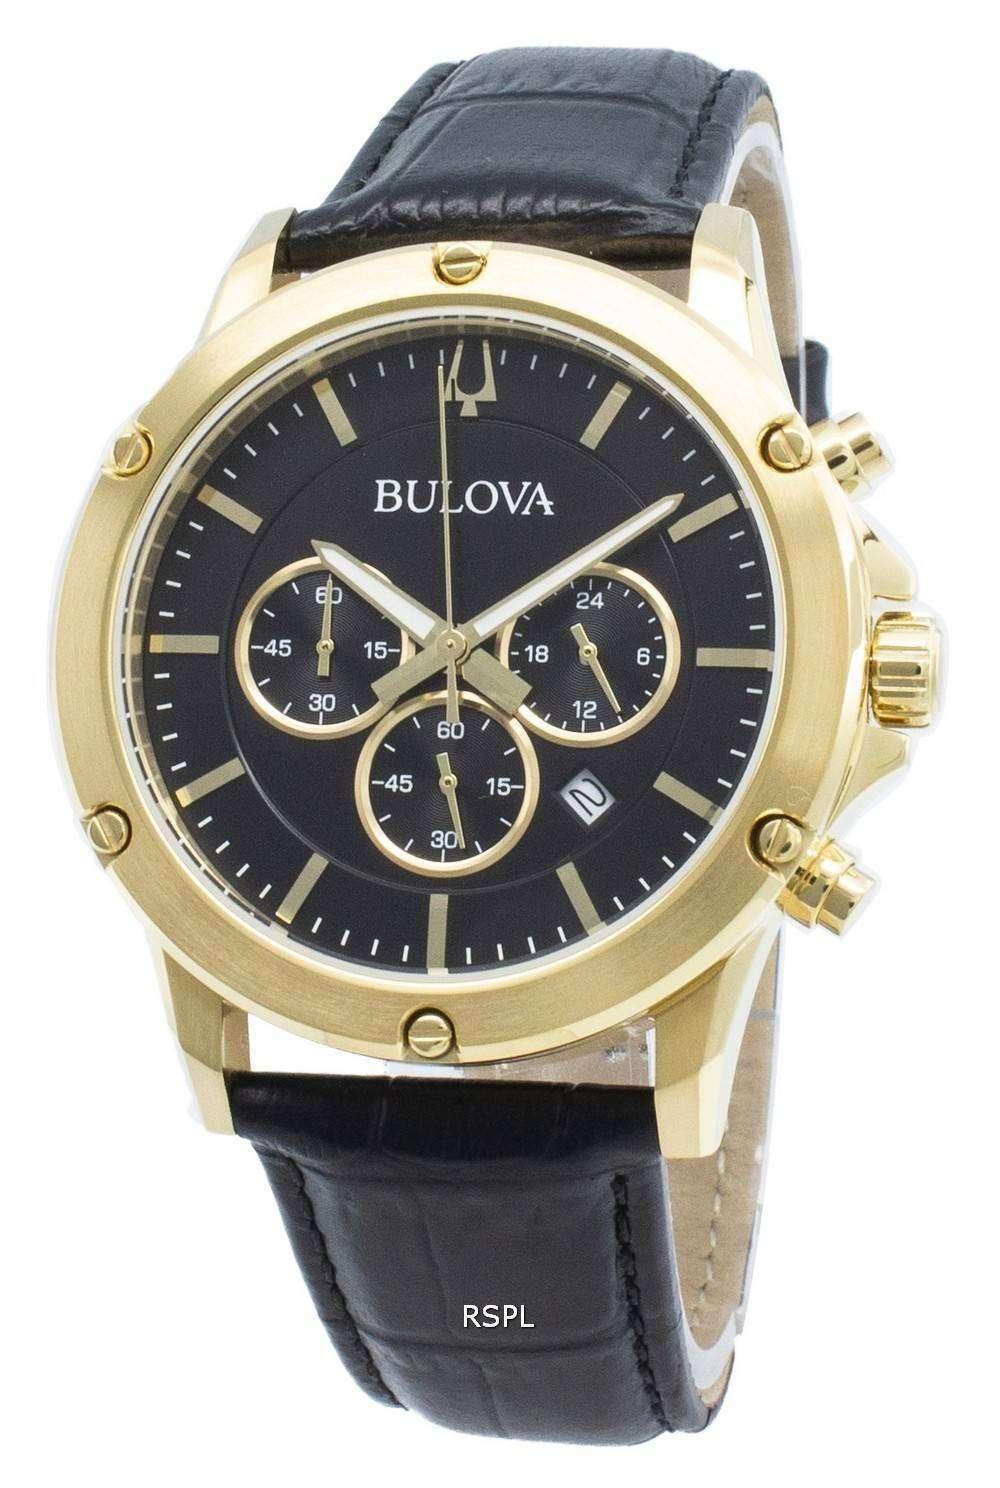 Bulova 97B179 Chronograph Quartz Men's Watch